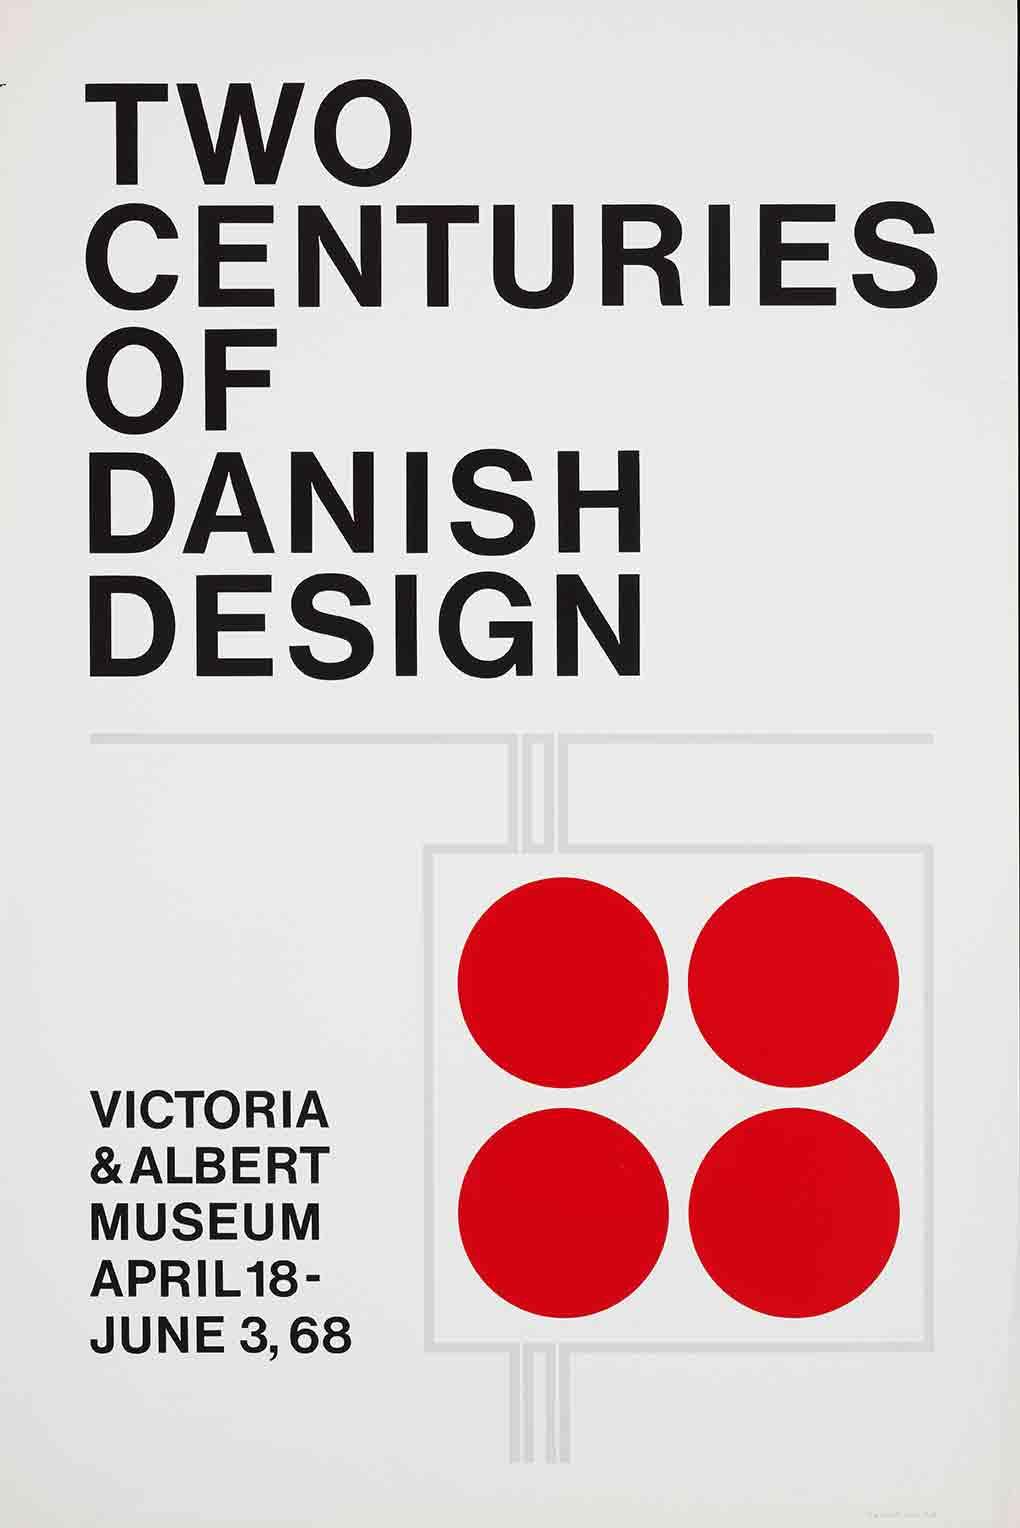 Two centuries of Danish Design exhibition poster (custom print)